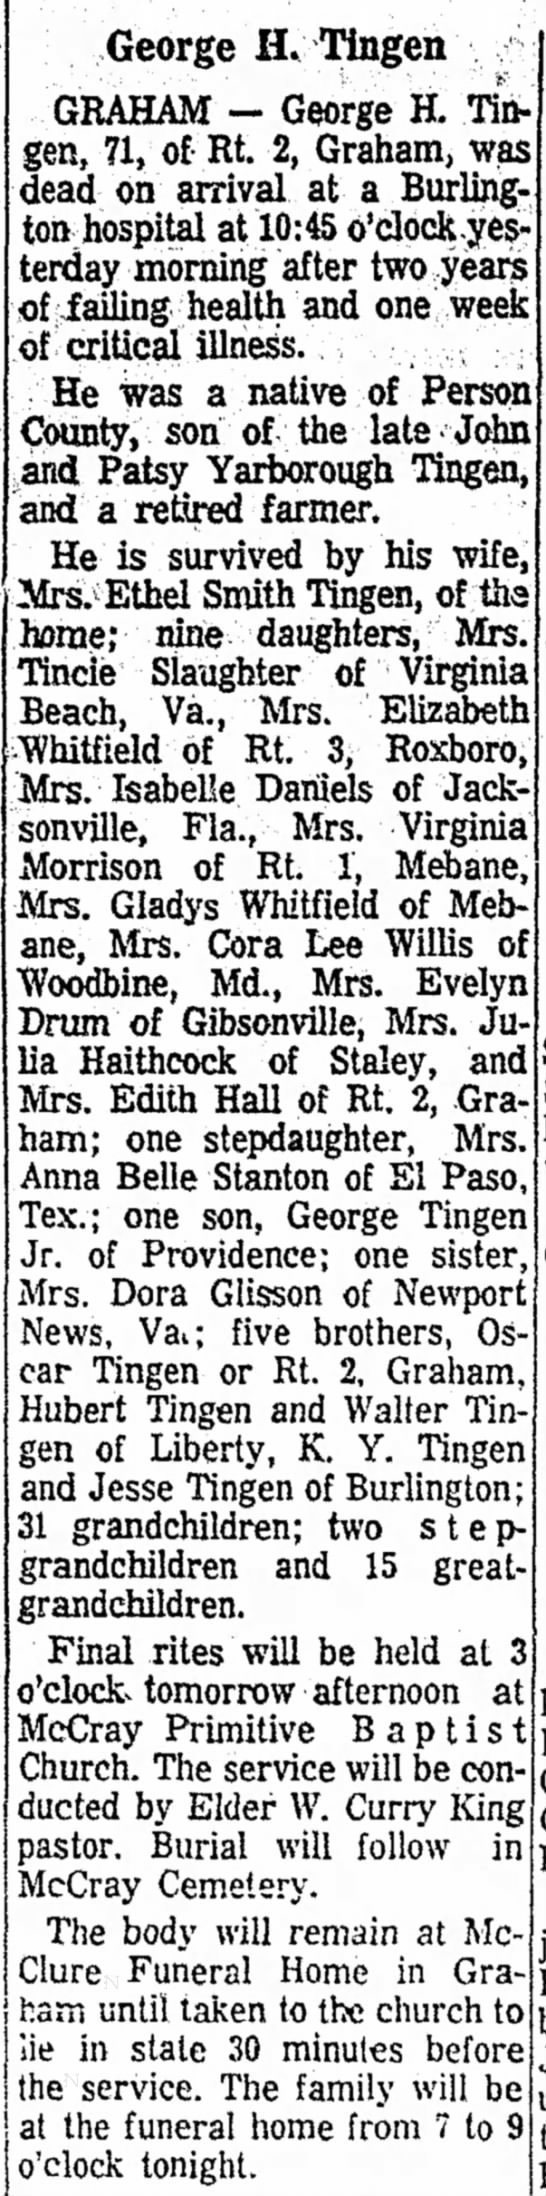 burlington times news obituaries